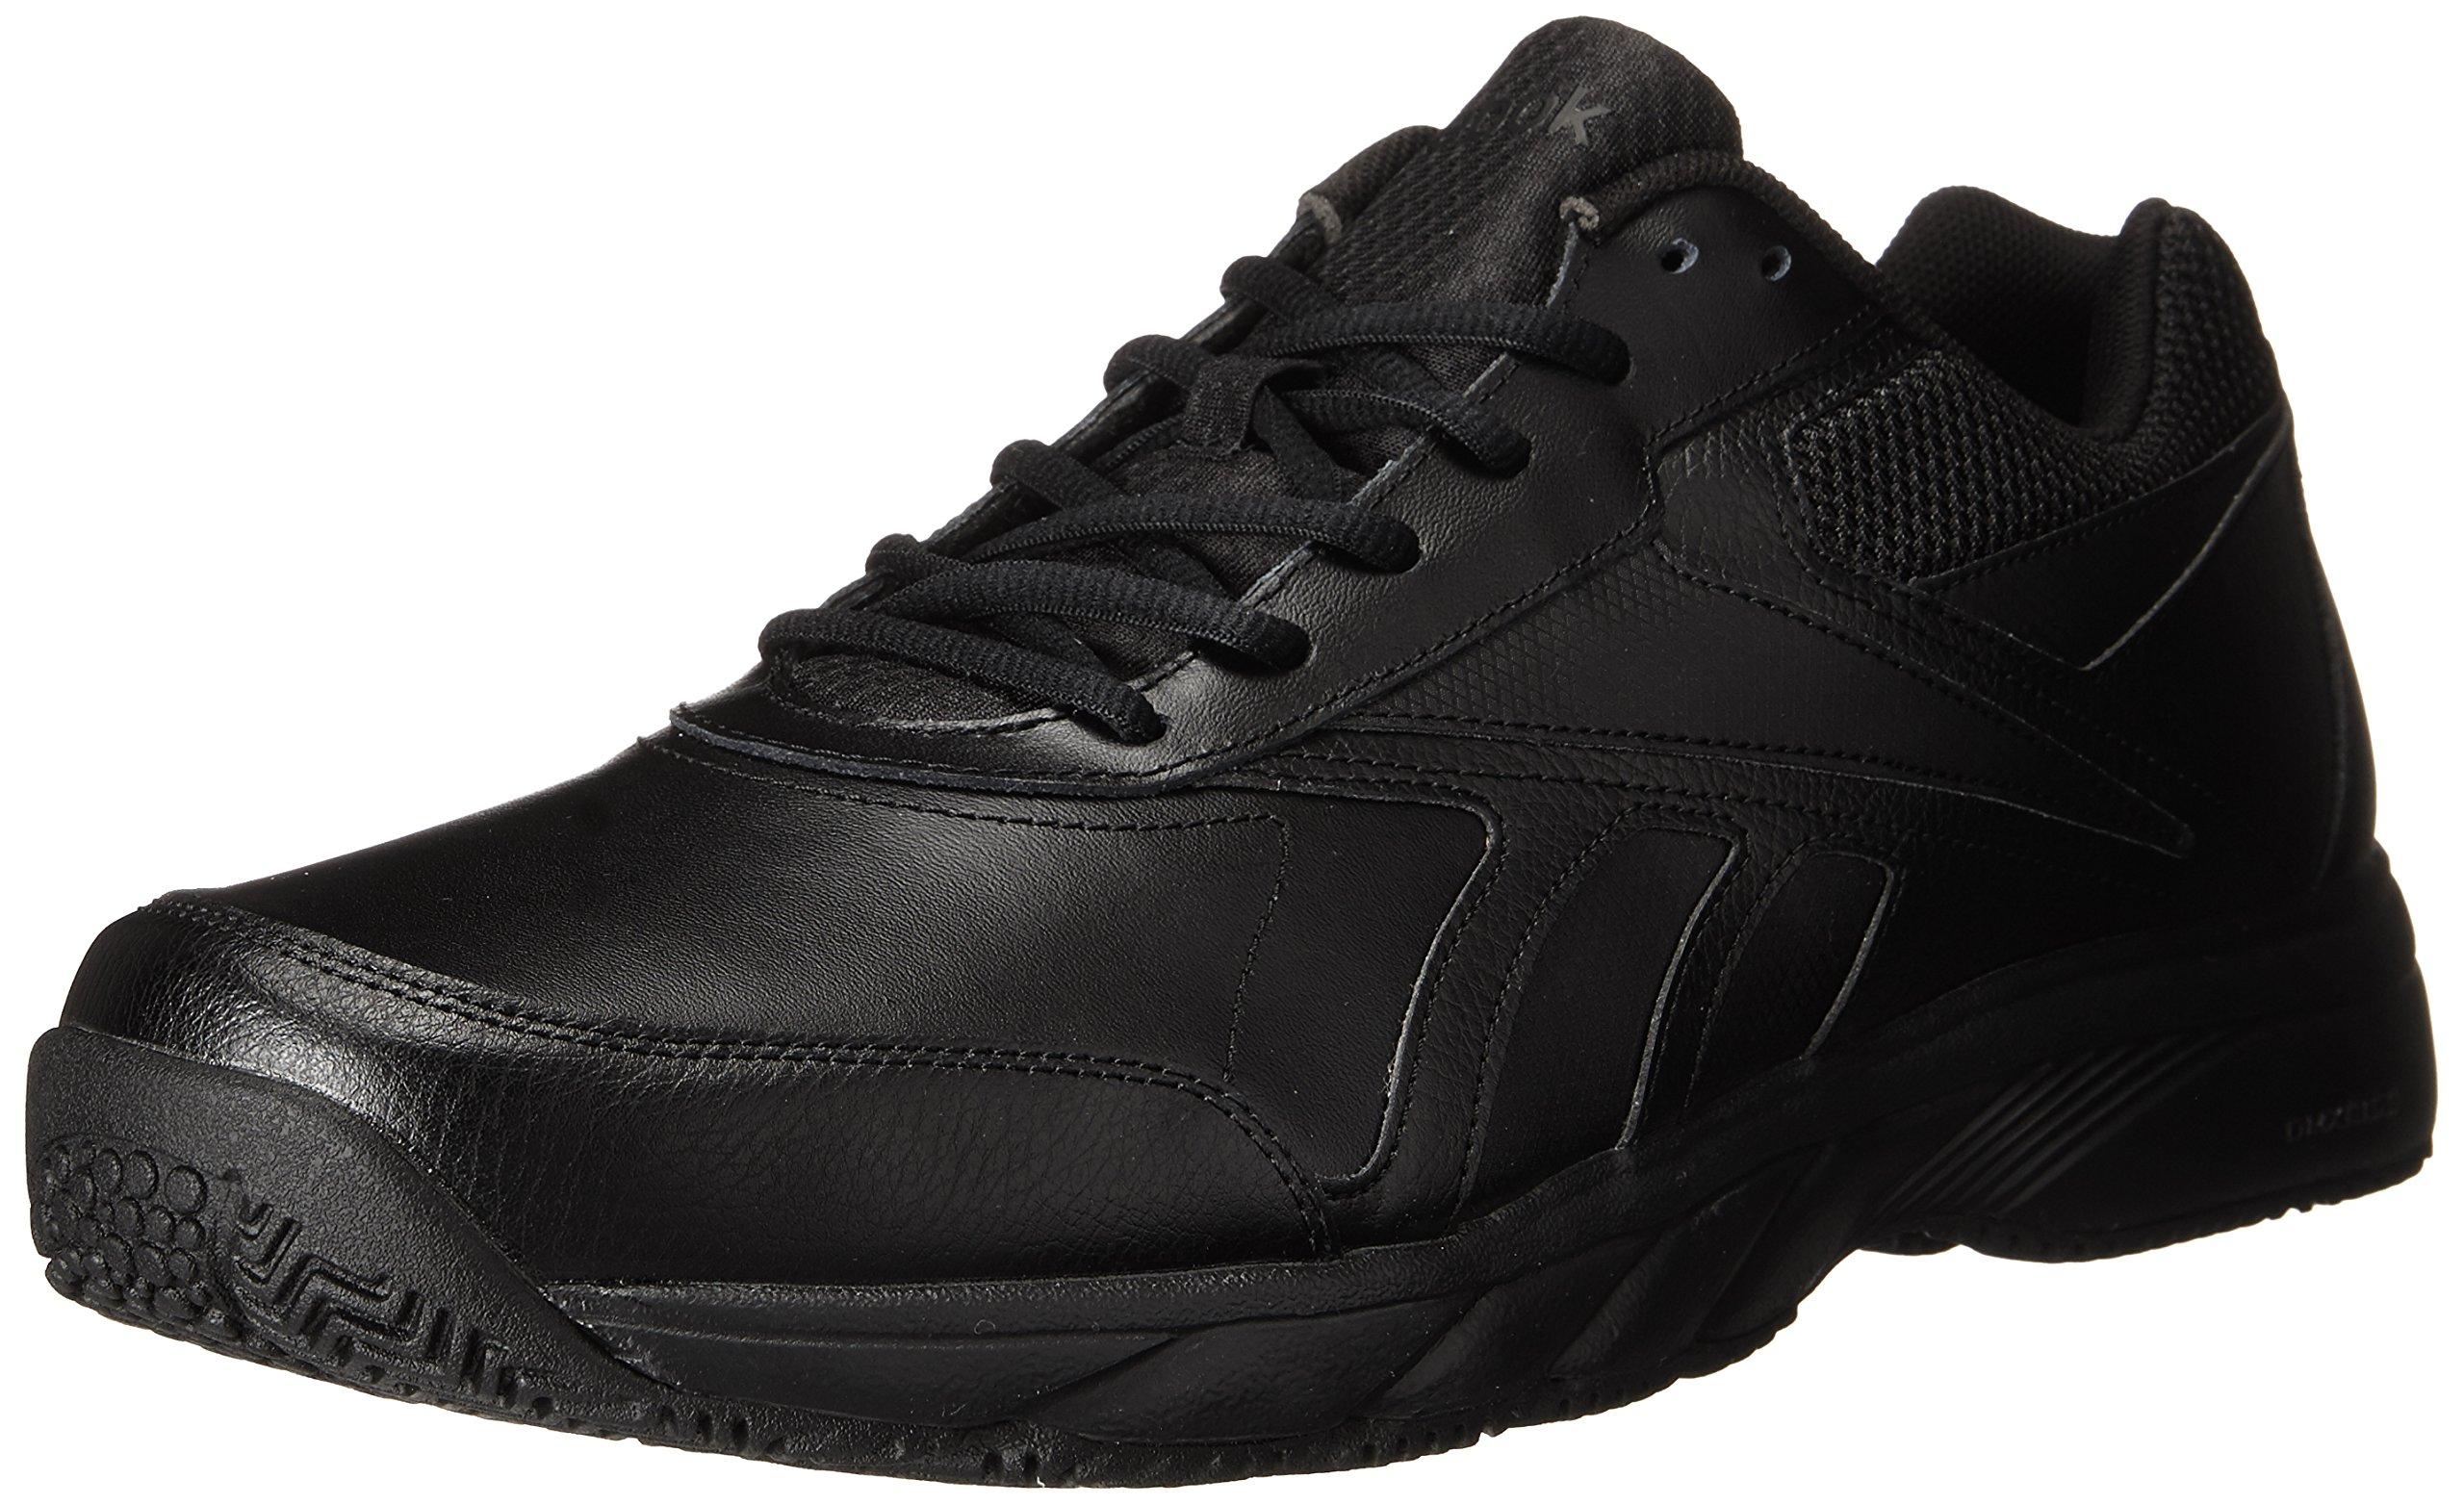 Reebok Men's Work N Cushion 2.0 Walking Shoe, Black/Black, 10.5 M US by Reebok